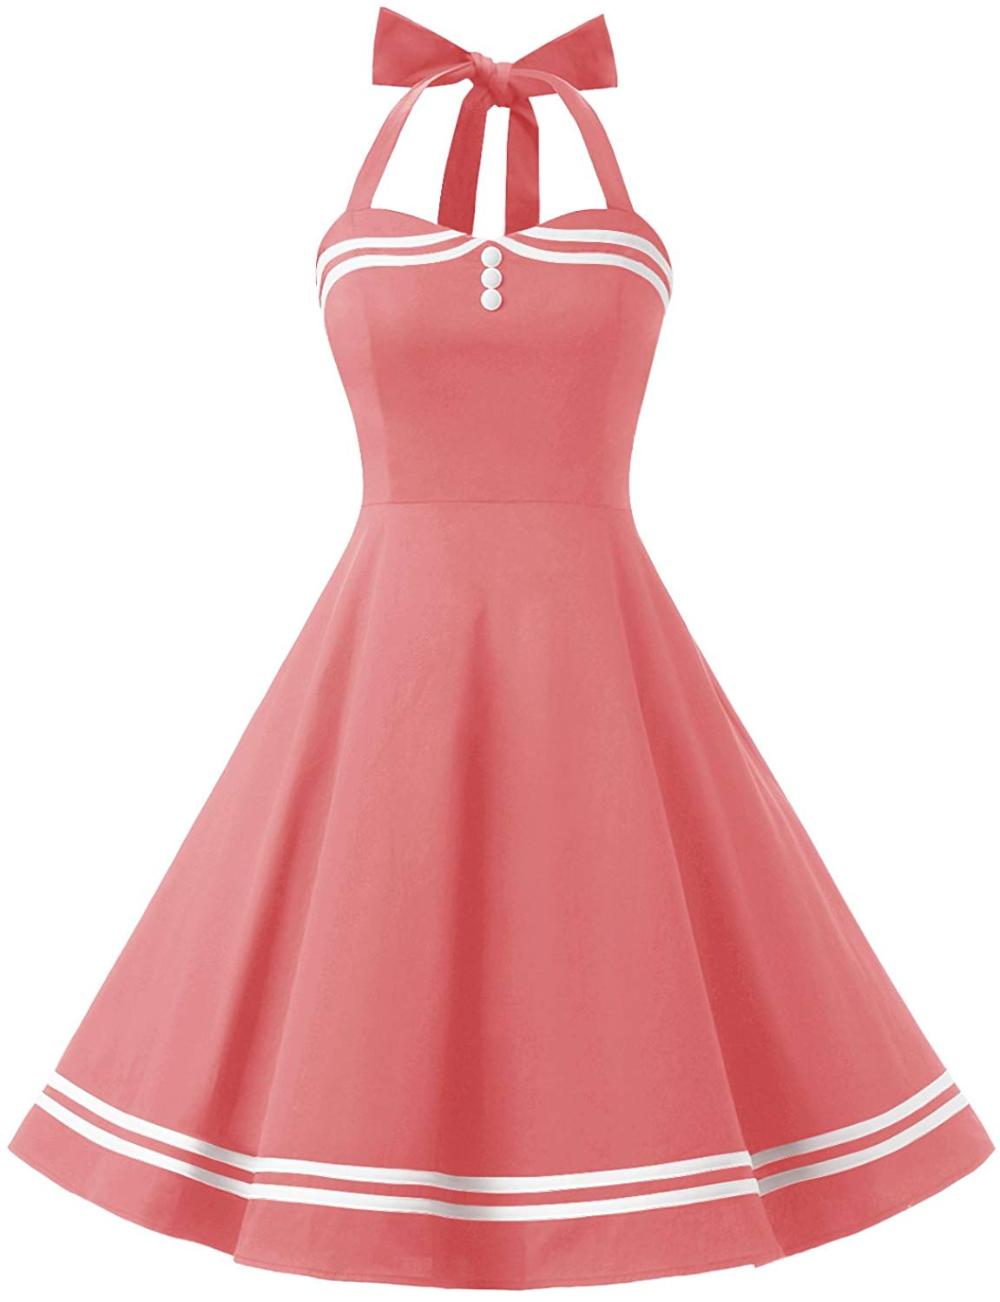 Amazon Com Find Dress Women 50s Vintage Short Halter Cocktail Dress With Buttons 10387 Burgundy 2x Vintage Dresses 50s Womens Vintage Dresses Rockabilly Dress [ 1302 x 1000 Pixel ]